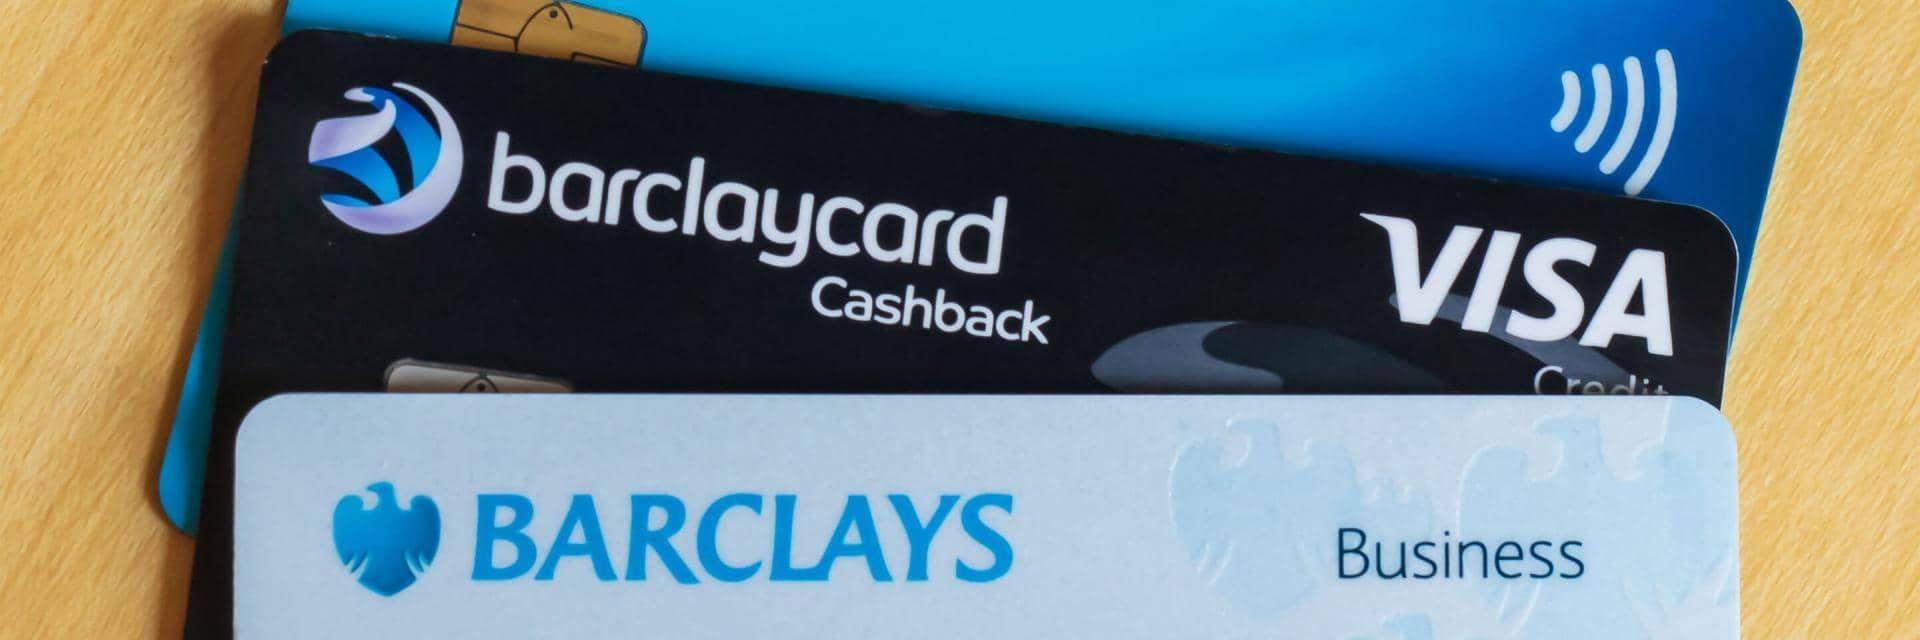 Business debit cards | Barclays